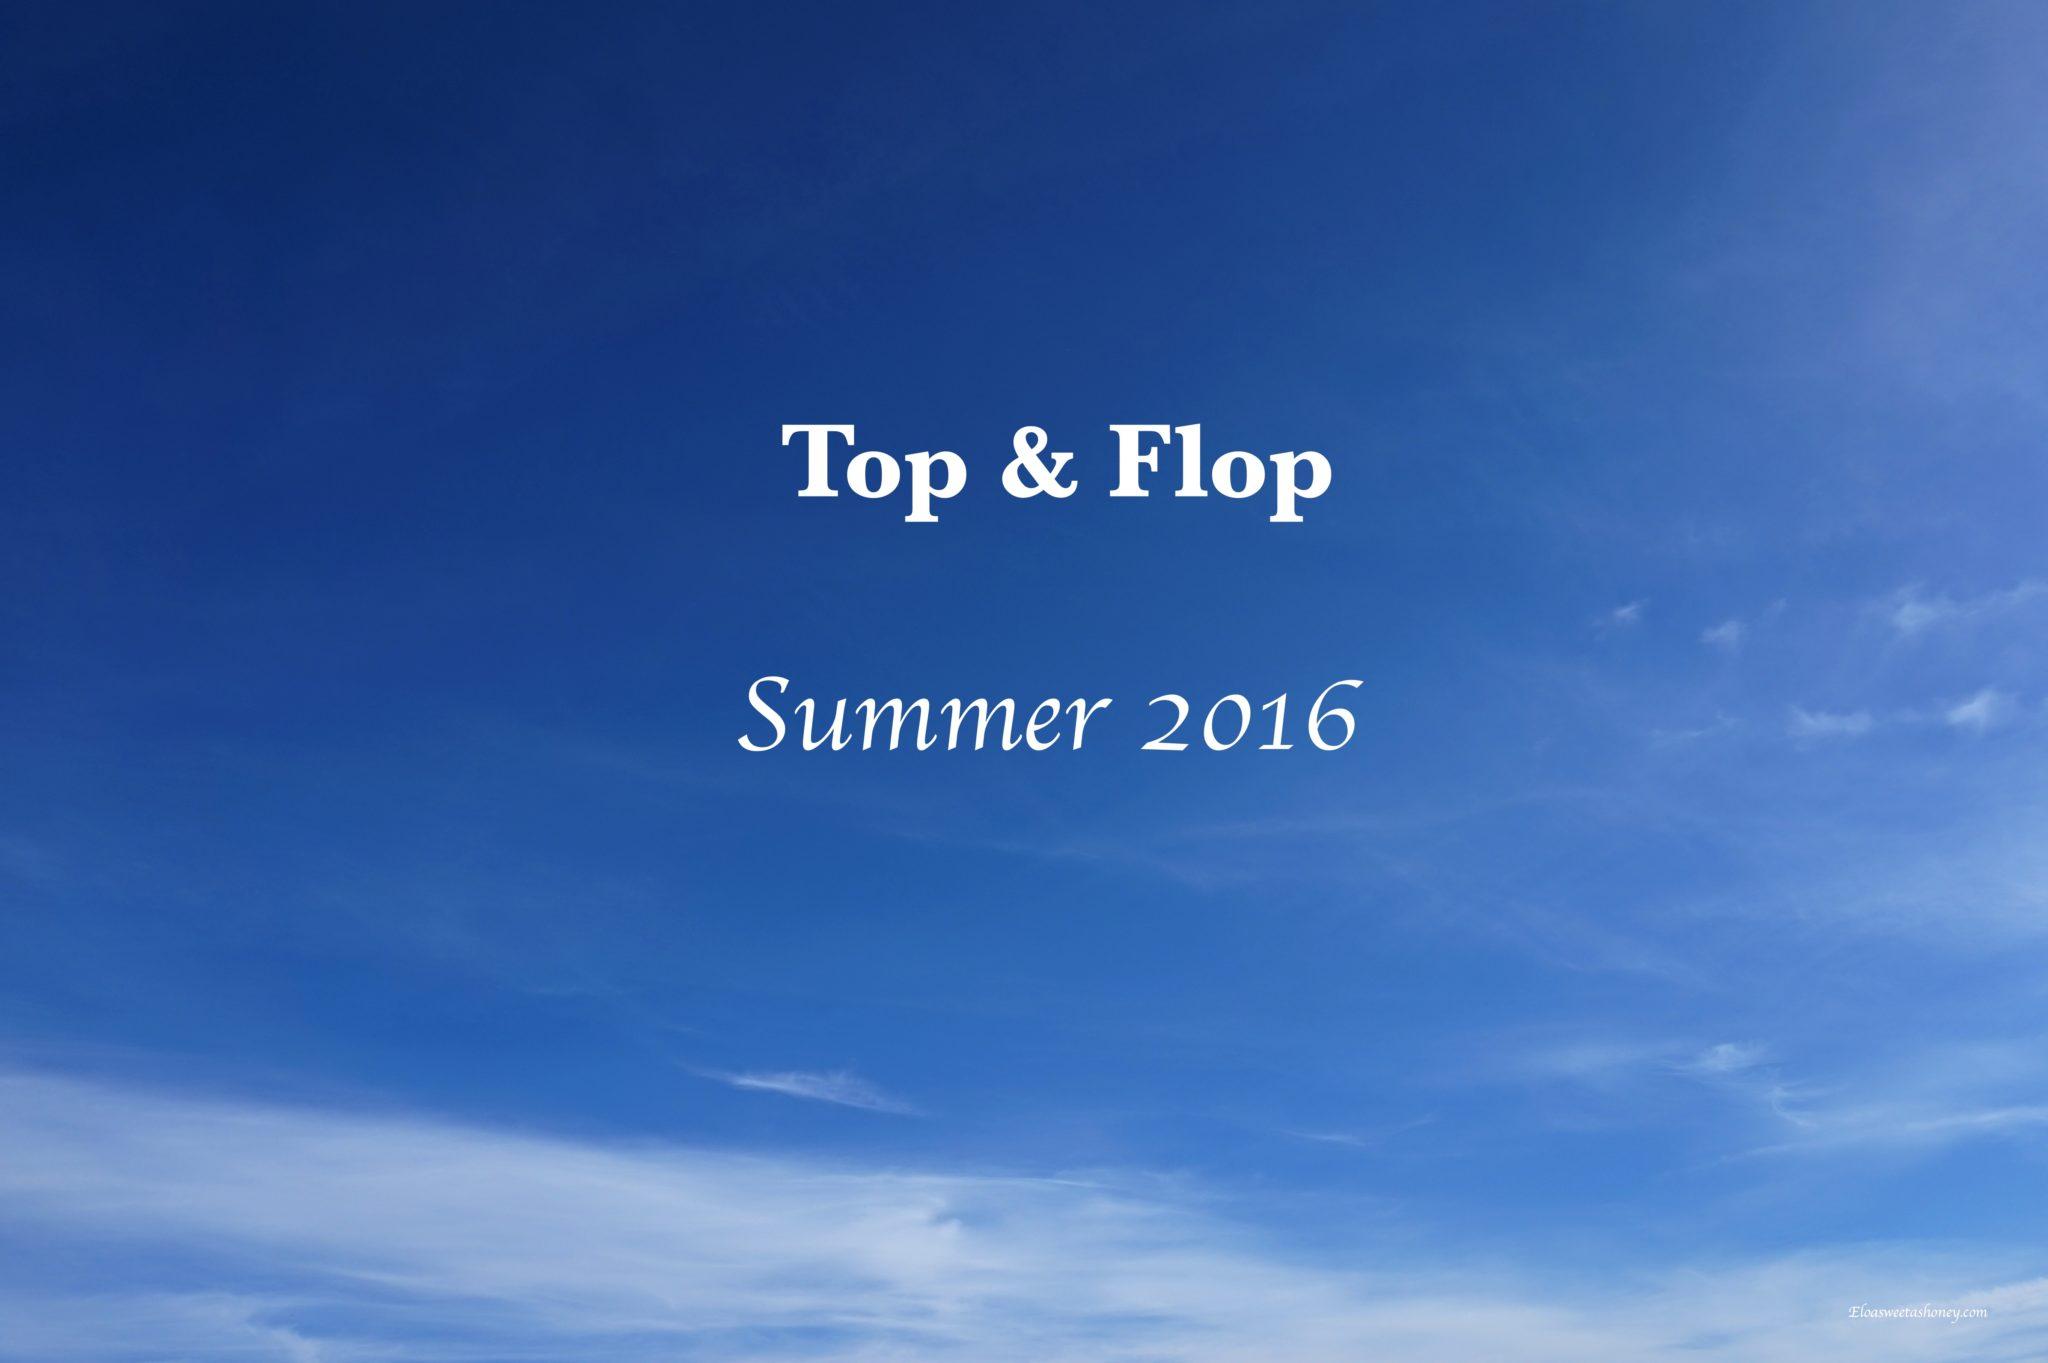 Top & Flop – July 2016